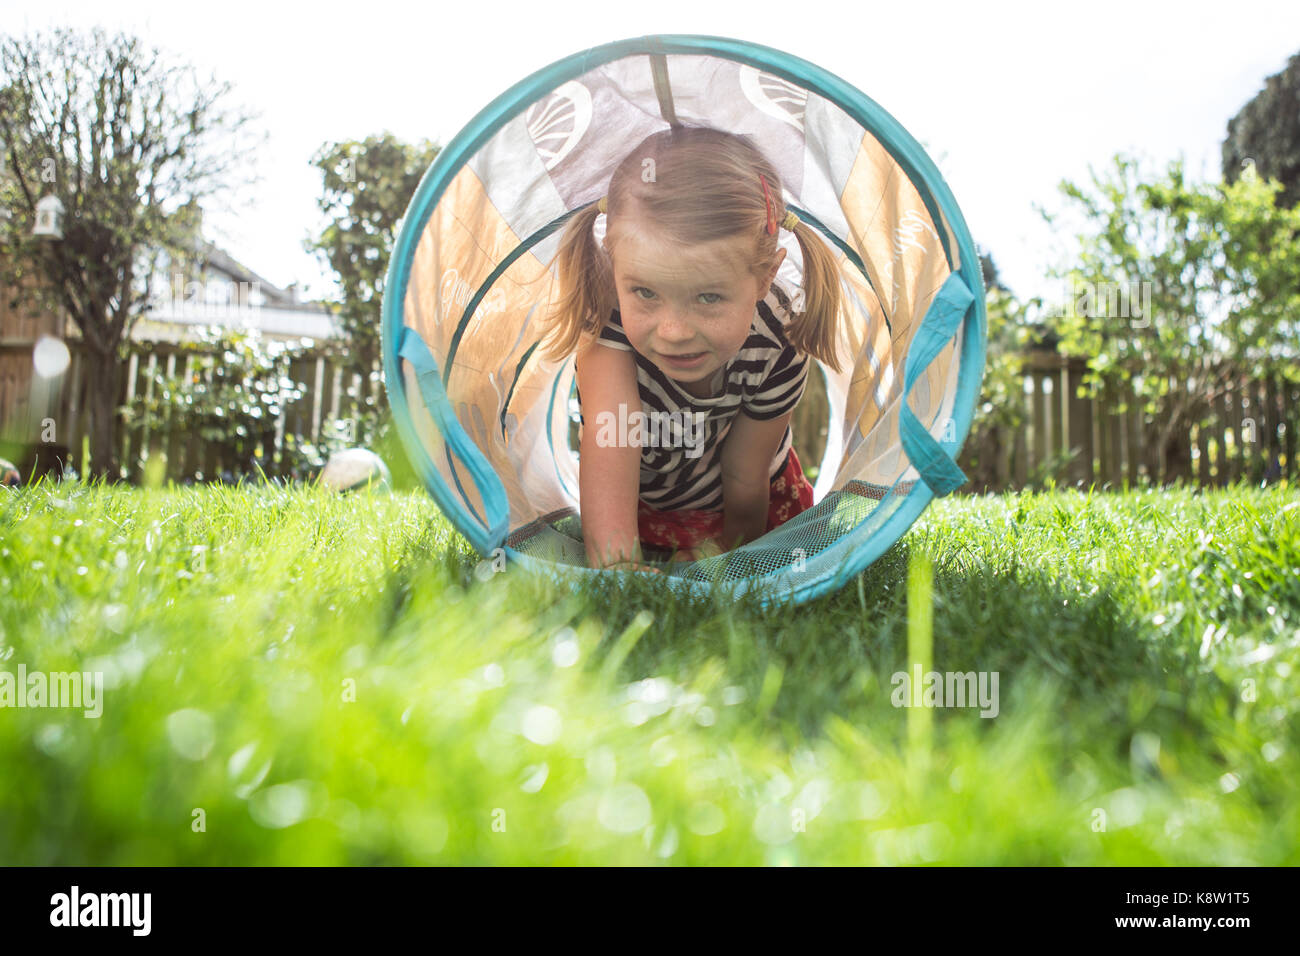 Little girl playing in garden Photo Stock